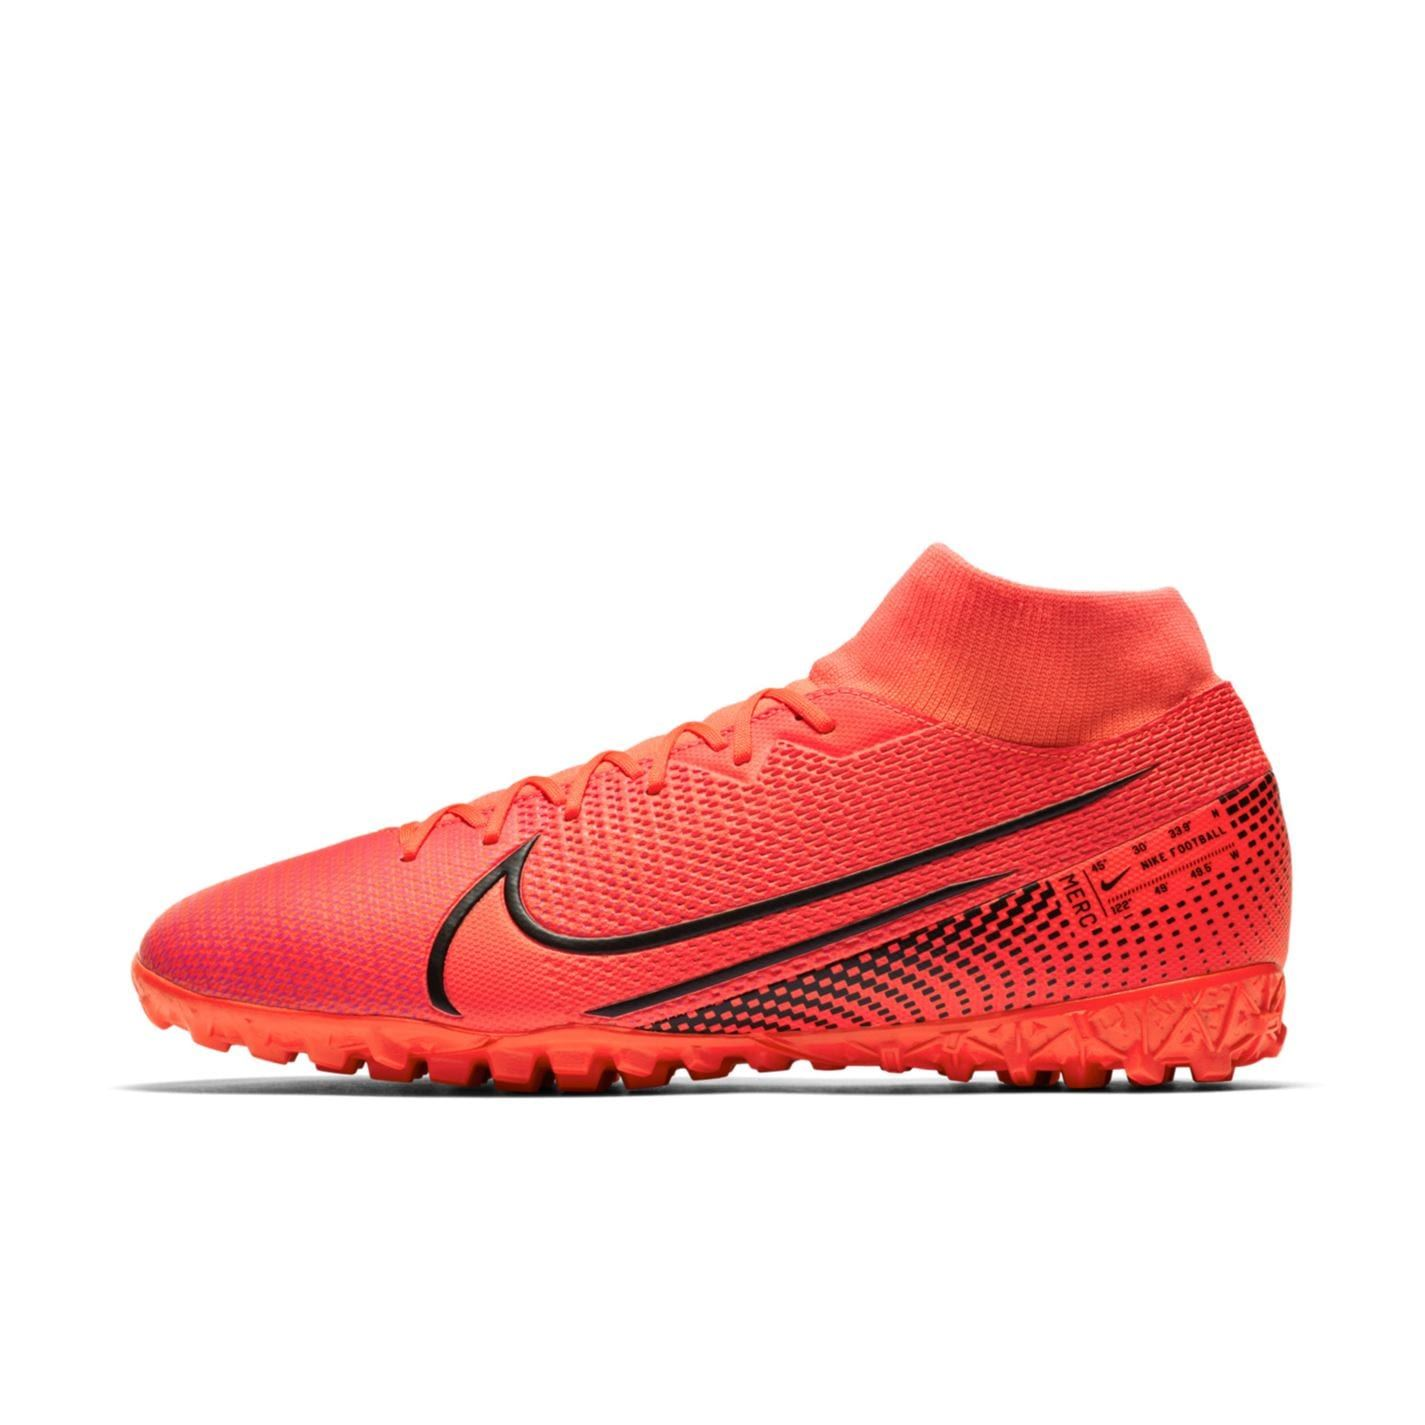 Nike Mercurial Superfly DF Astro Turf